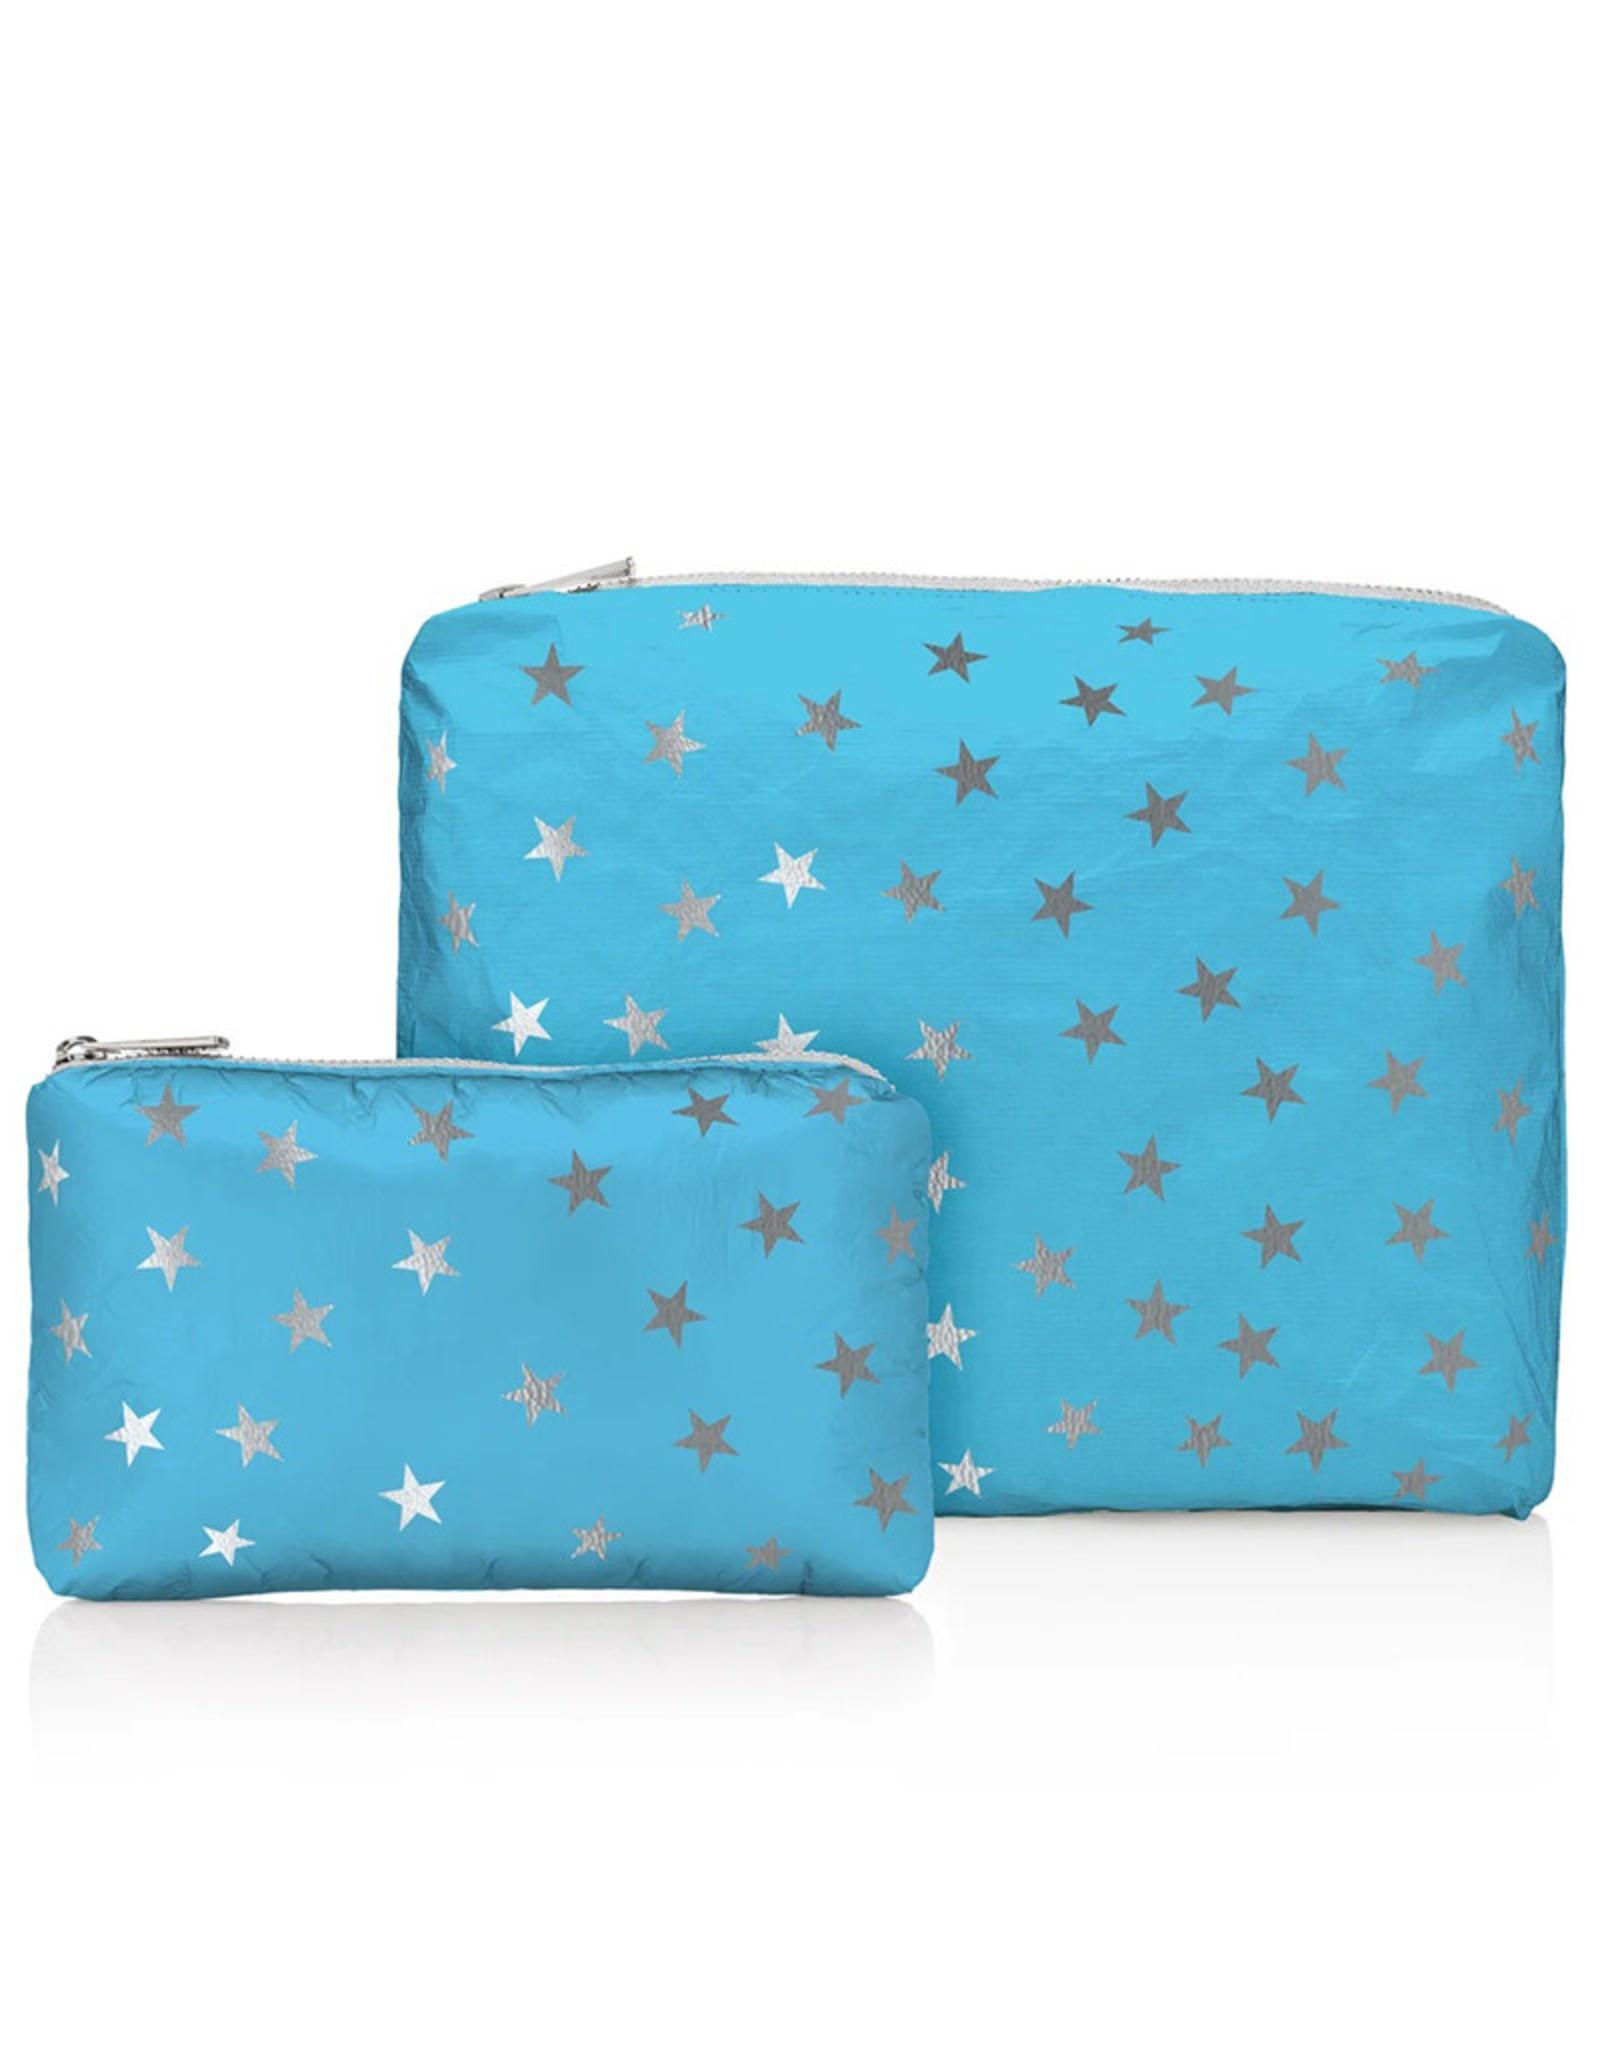 HI LOVE TRAVEL SET OF 2-SKY BLUE WITH MYRIAD SILVER STARS